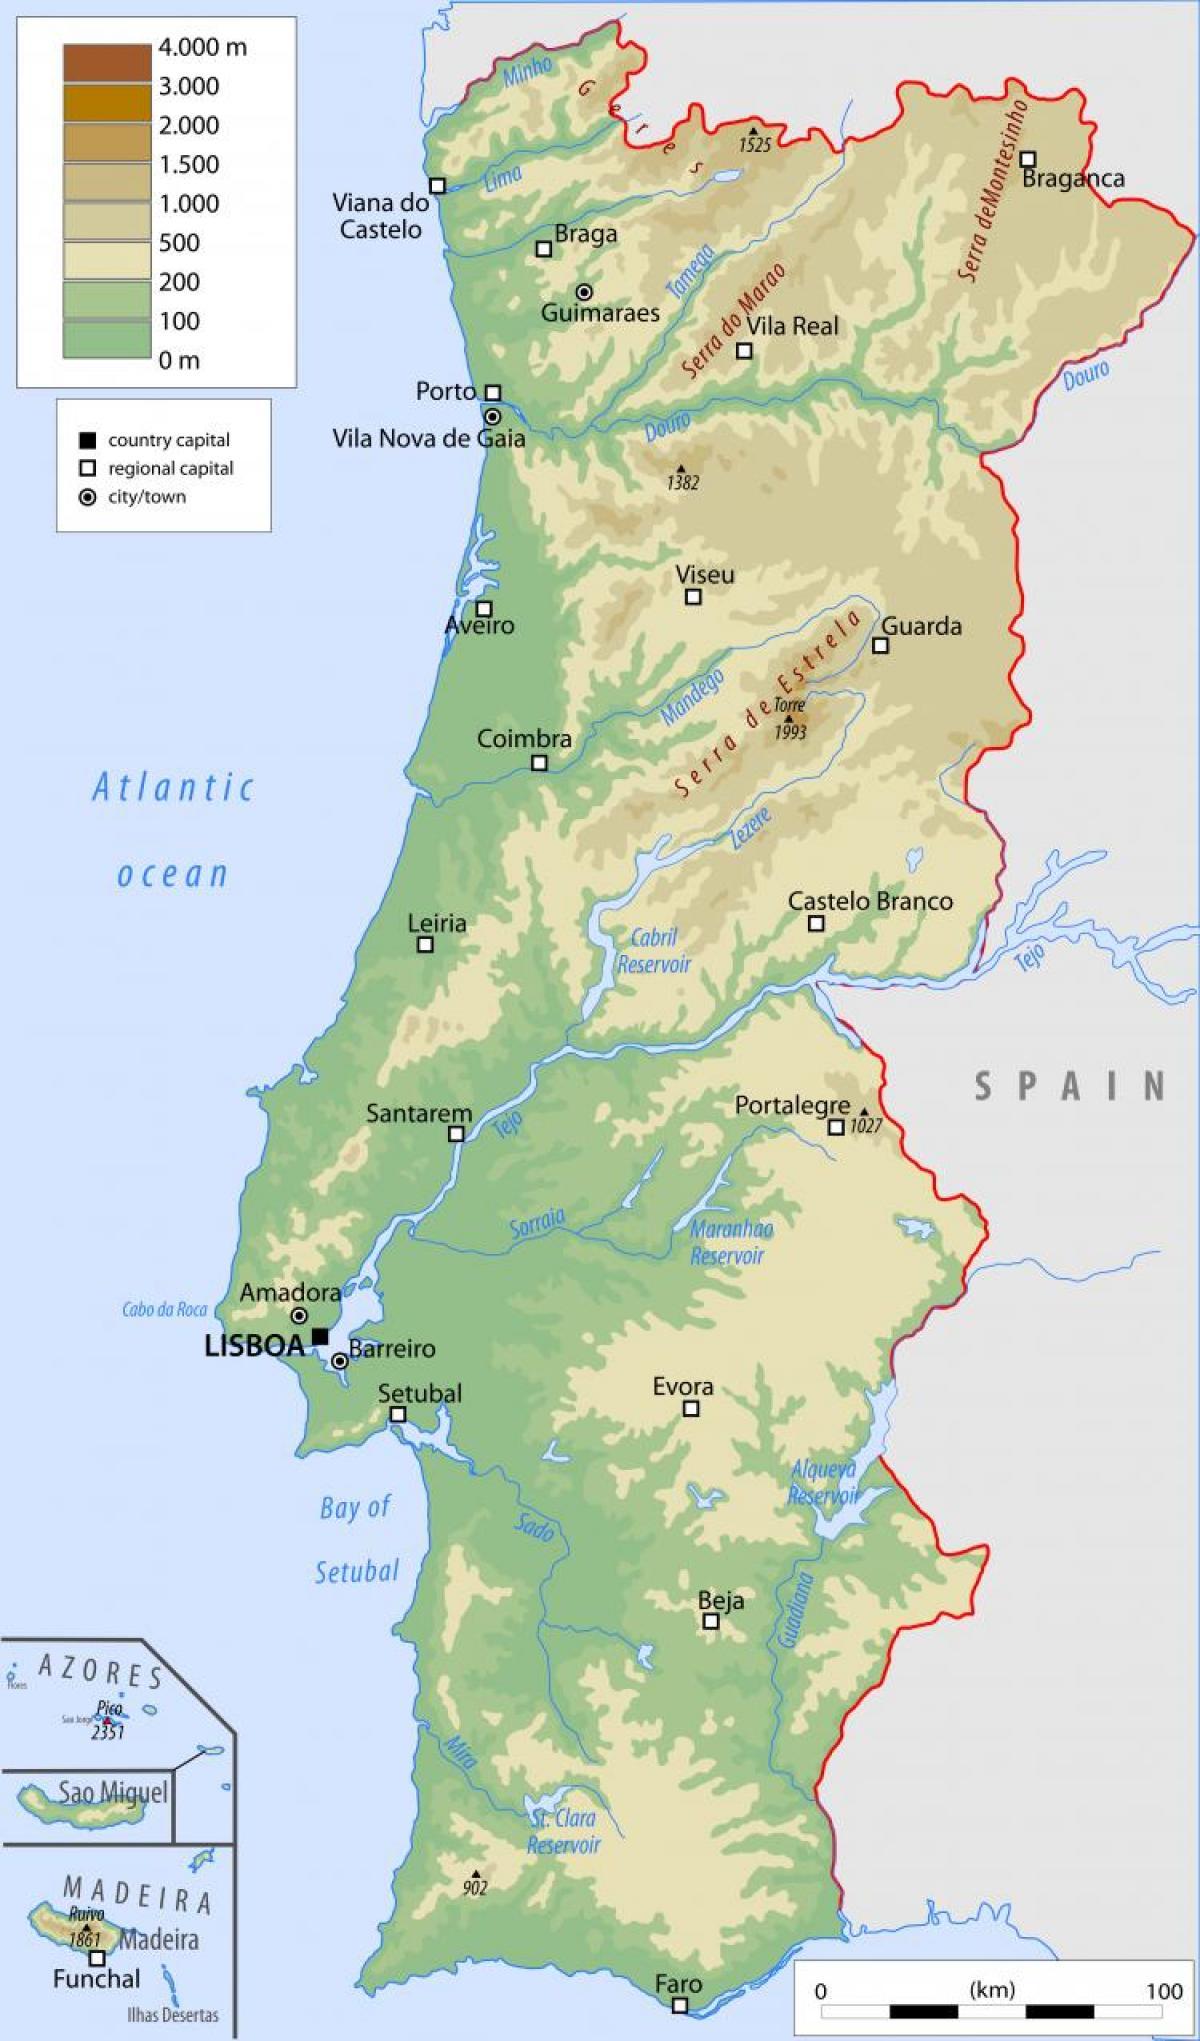 kart over portugal Portugal fysisk kart   Fysisk kart over Portugal (Sør Europa   Europa) kart over portugal